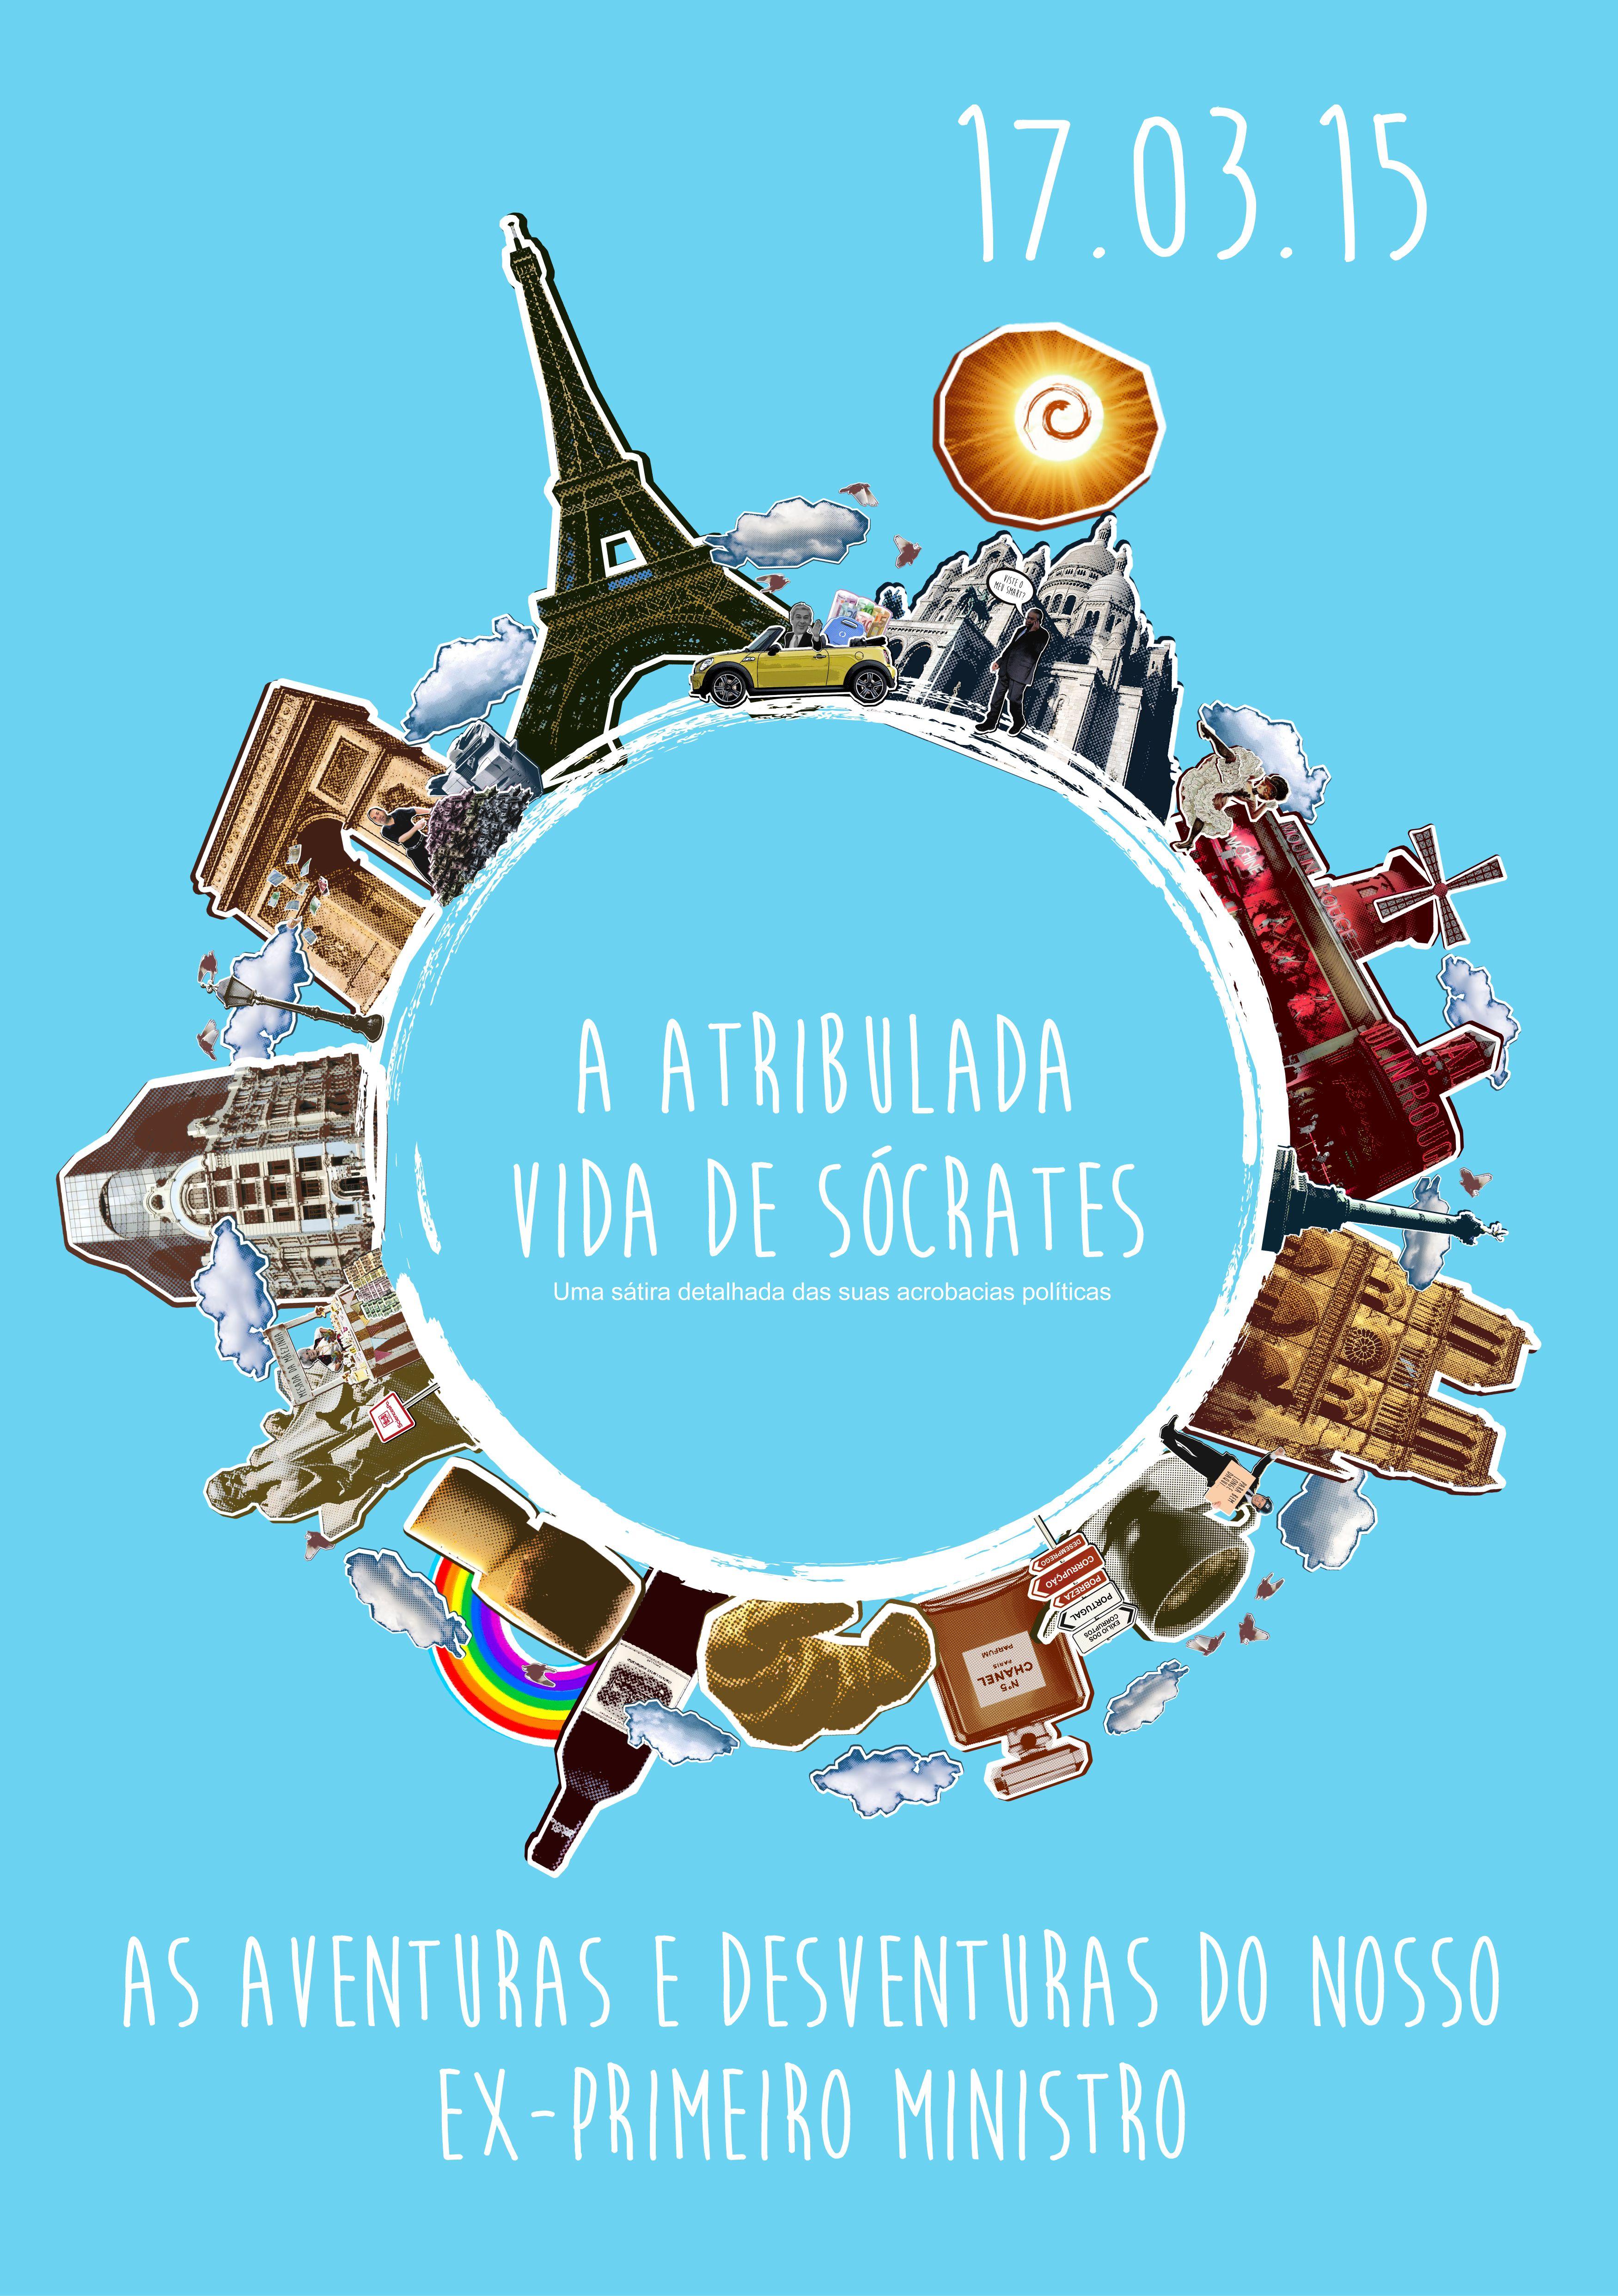 Cartaz Promocional - A agitada vida de Sócrates  https://www.youtube.com/watch?v=BGy_fmq8LXg